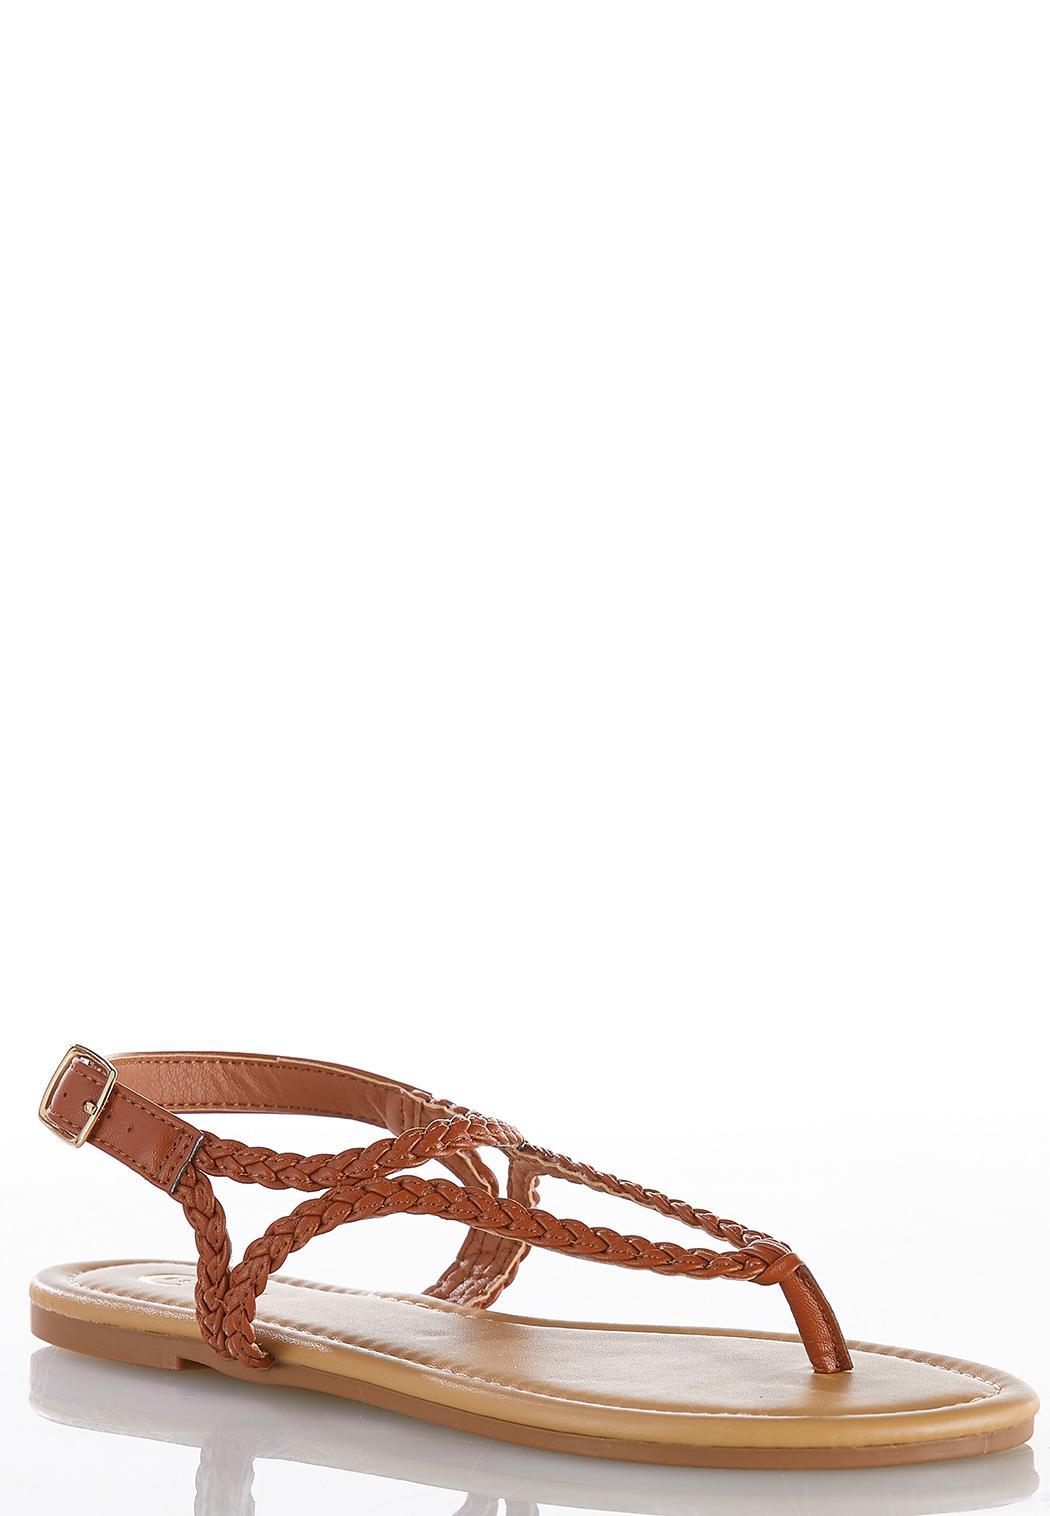 Braided Slingback Sandals